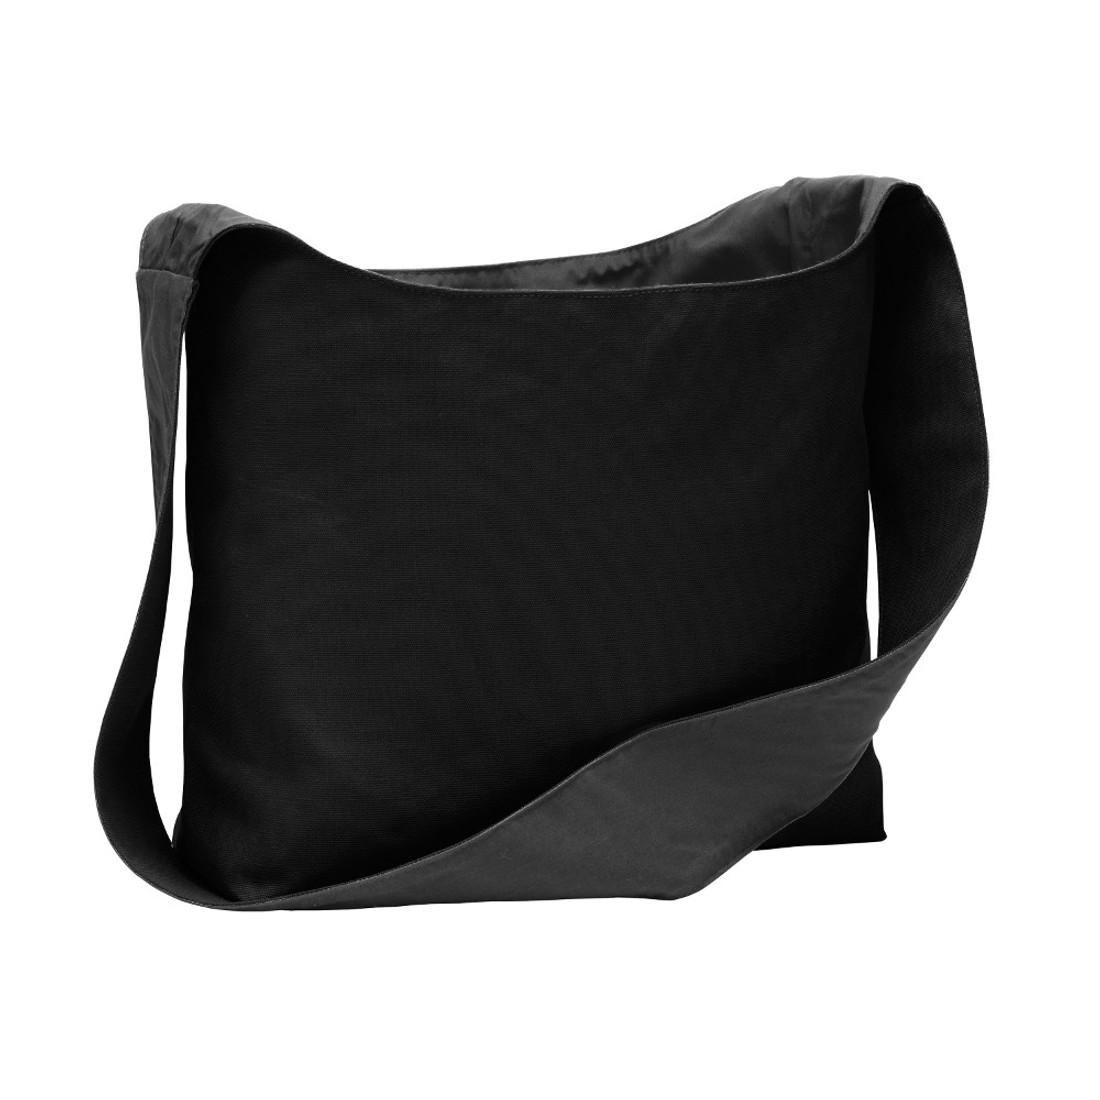 Blank picture of black sling bag.